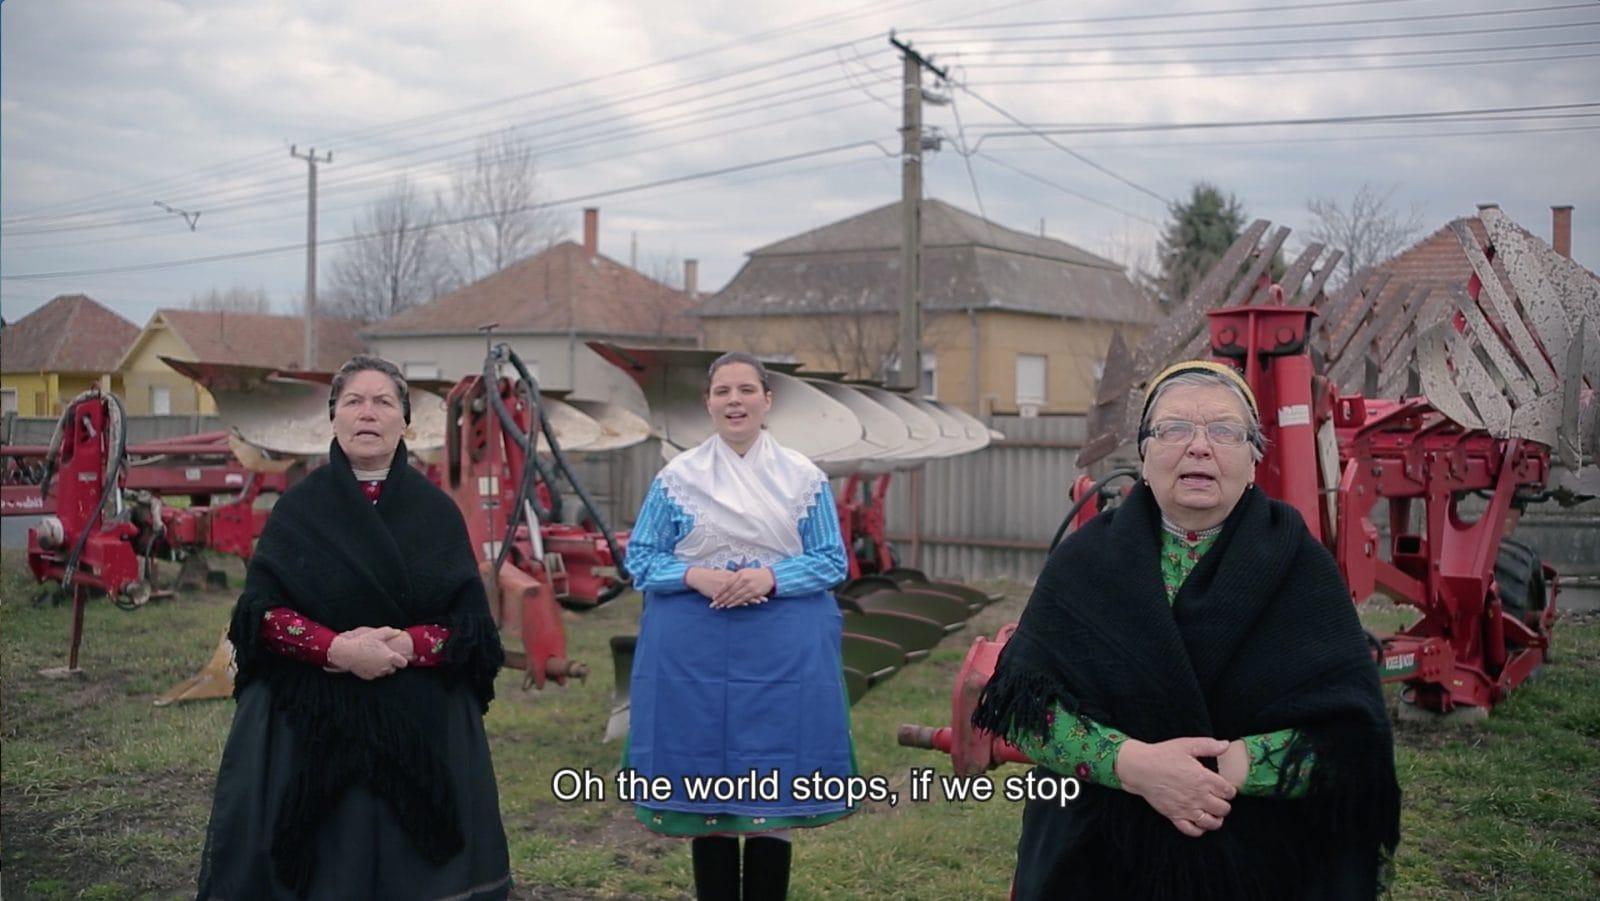 News Medley, 2020, video still © Árpád Horváth. The video is part of the project News Medley by Alicja Rogalska, Katalin Erdődi, and Réka Annus